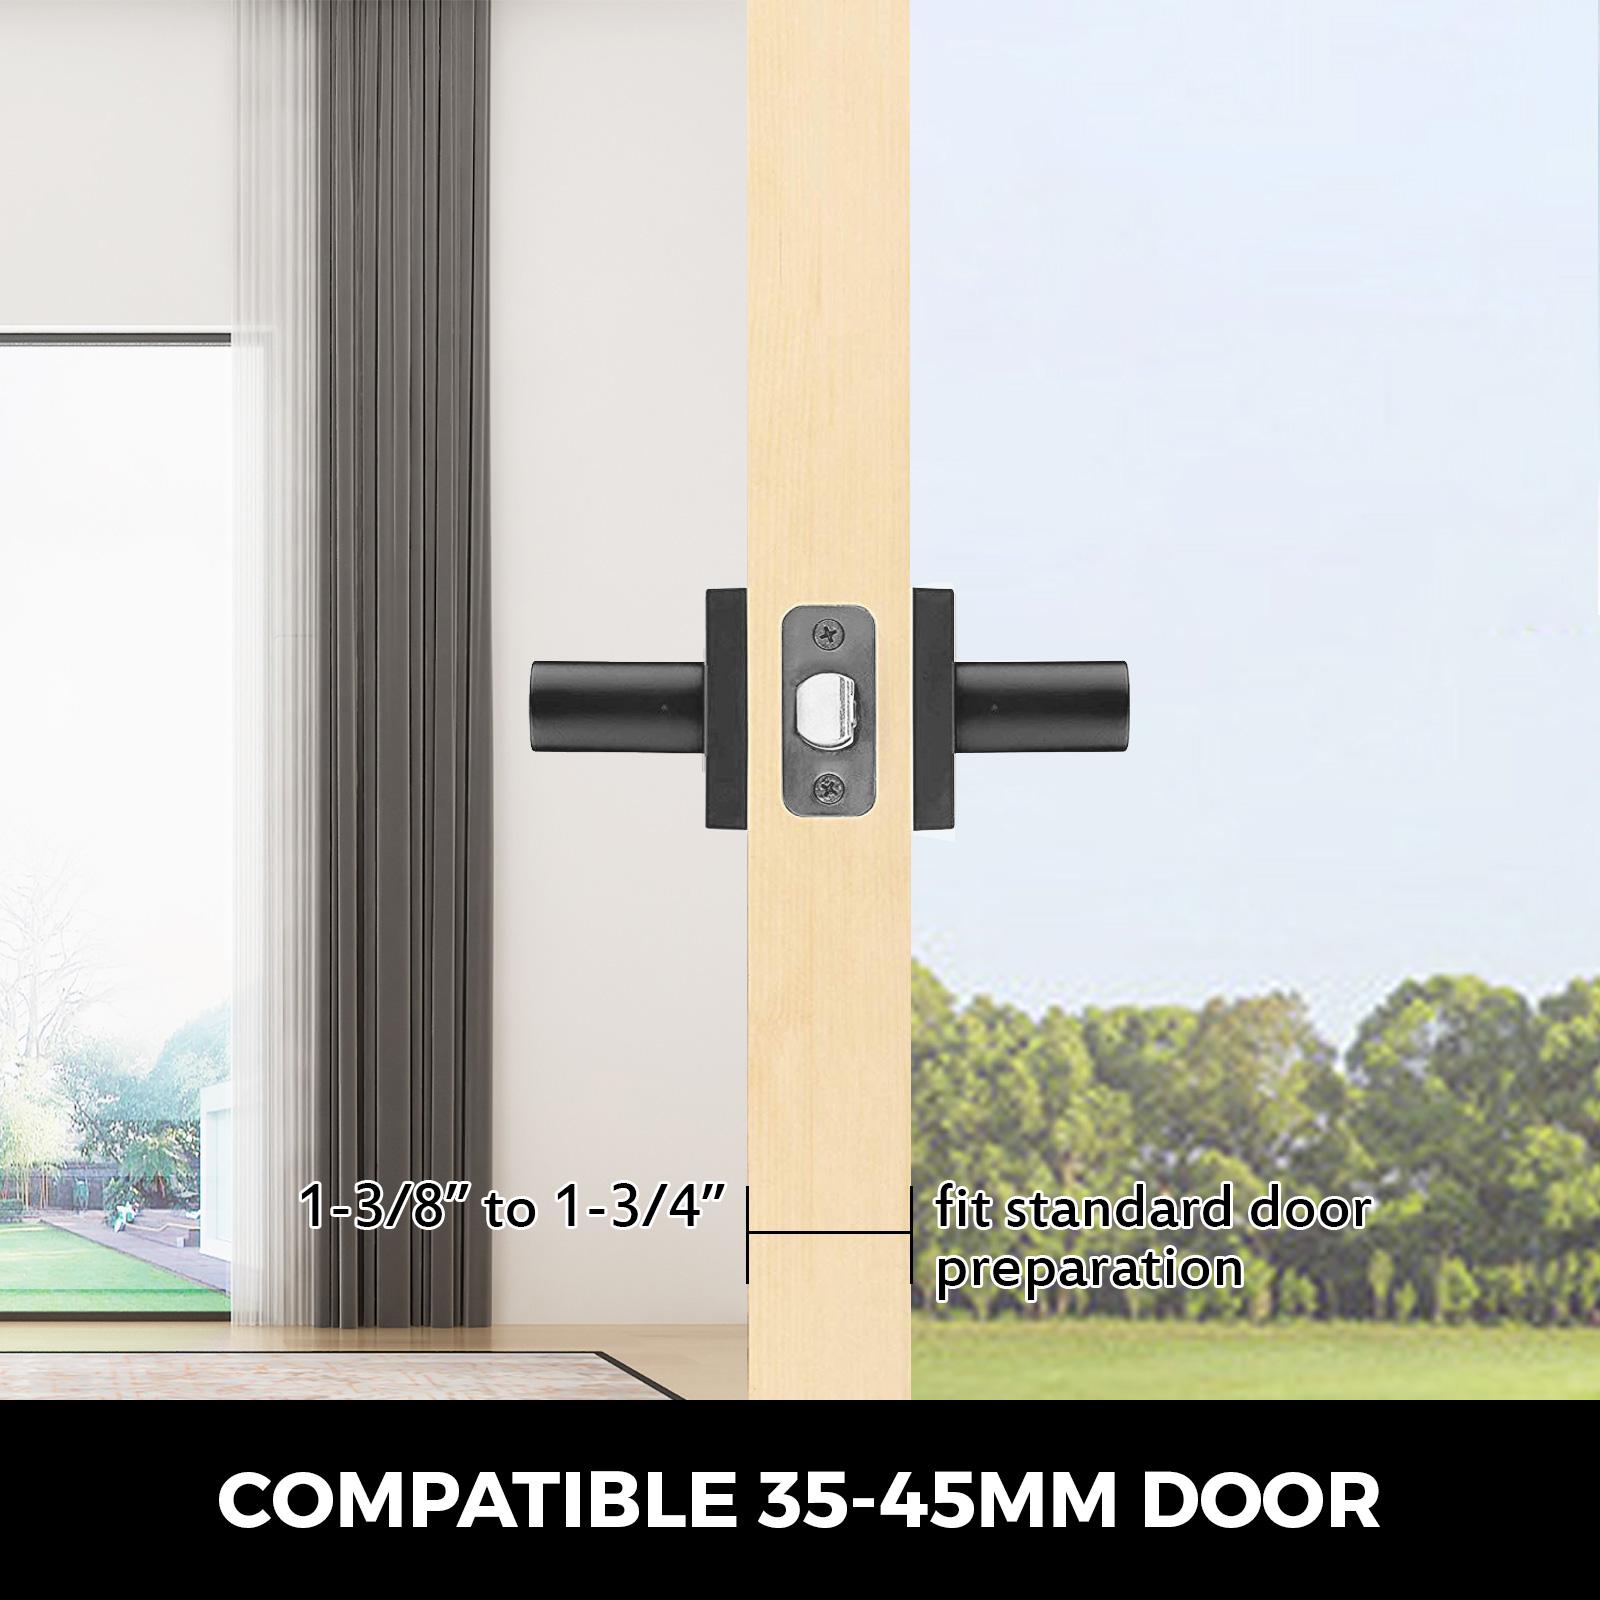 Door-Handles-Matte-Black-Door-Lever-3-5-10-Pack-Passage-Privace-Entry-Lock-Set thumbnail 29